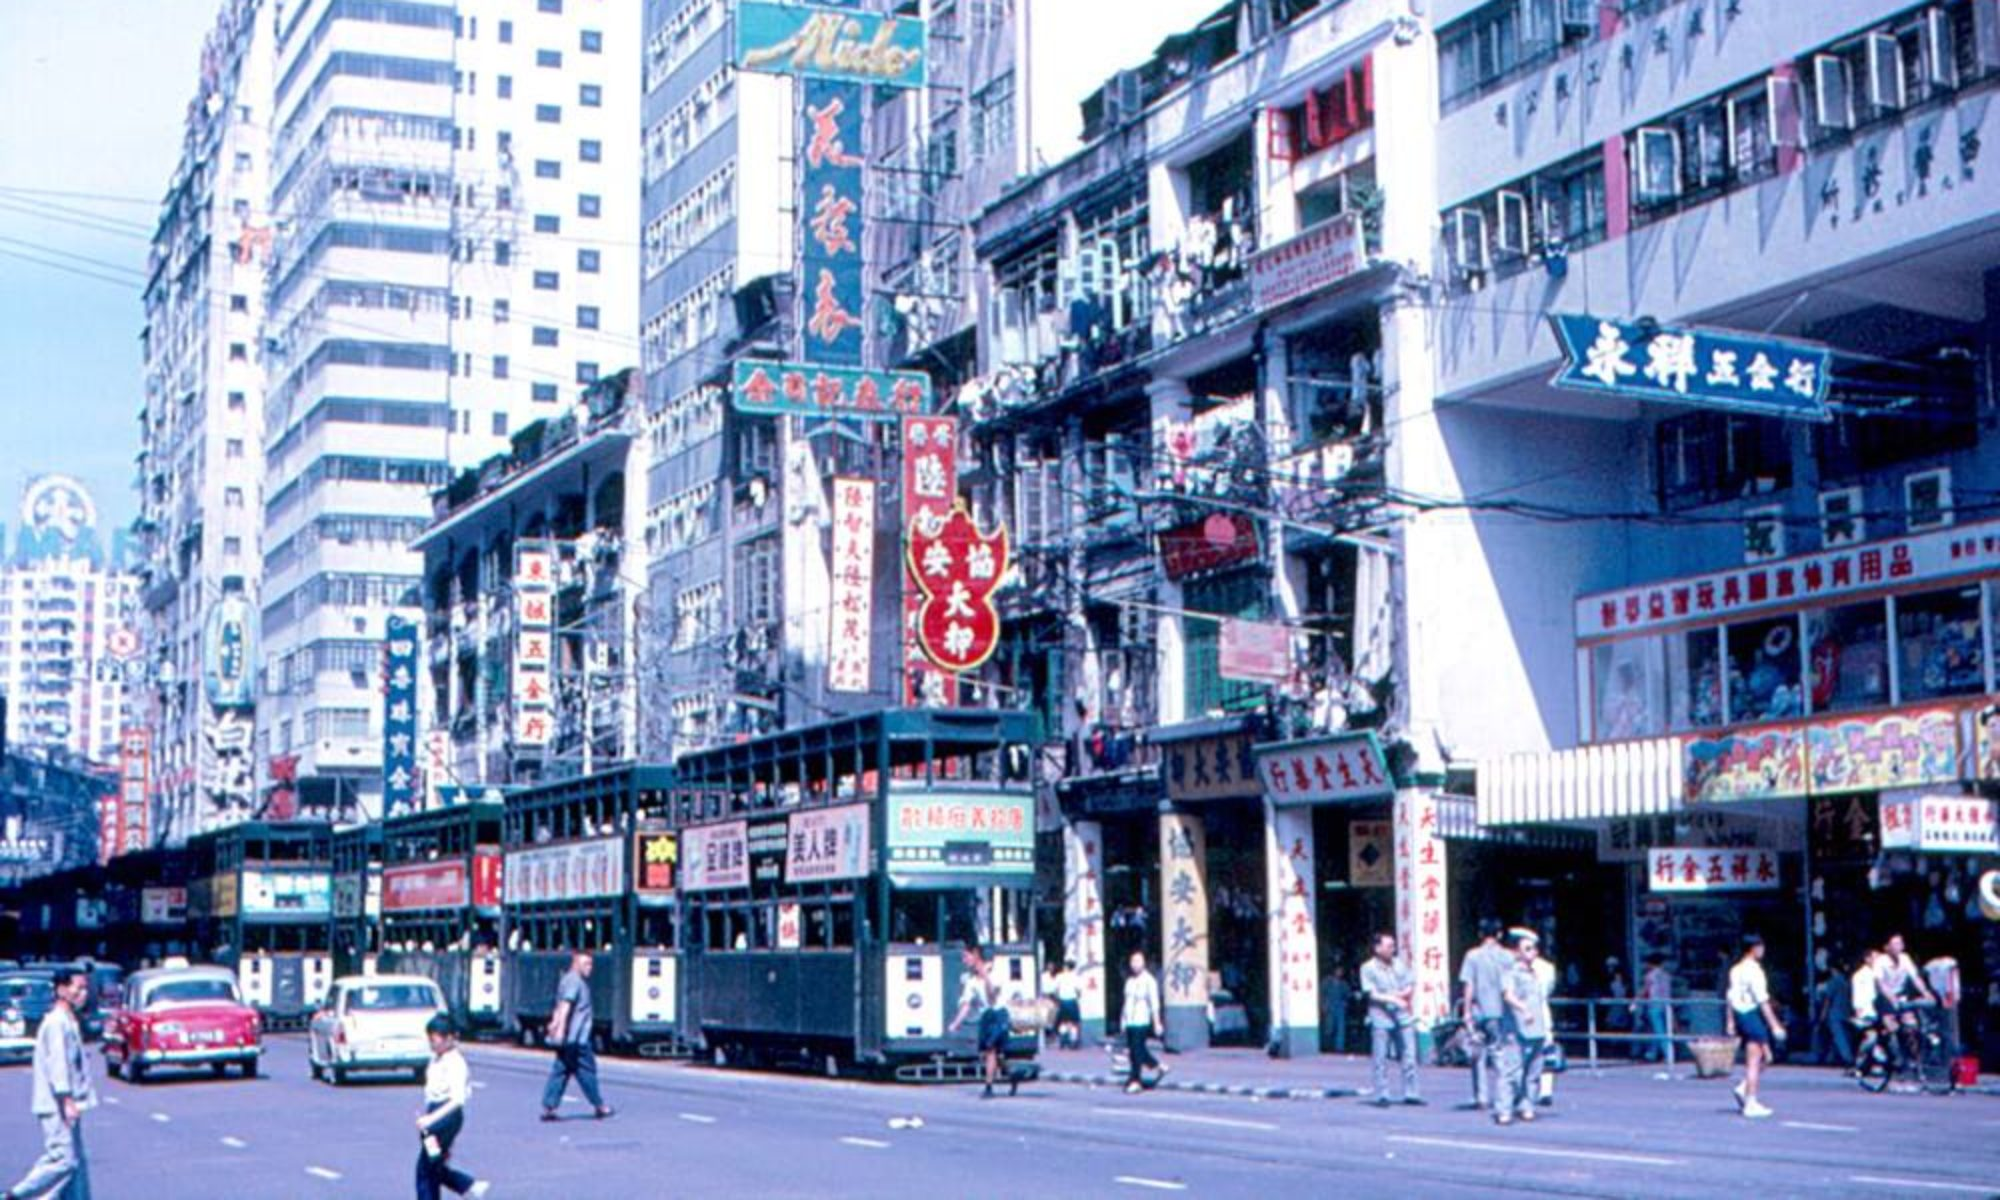 香港電車文化保育學會 Hong Kong Trams Culture Preservation Society